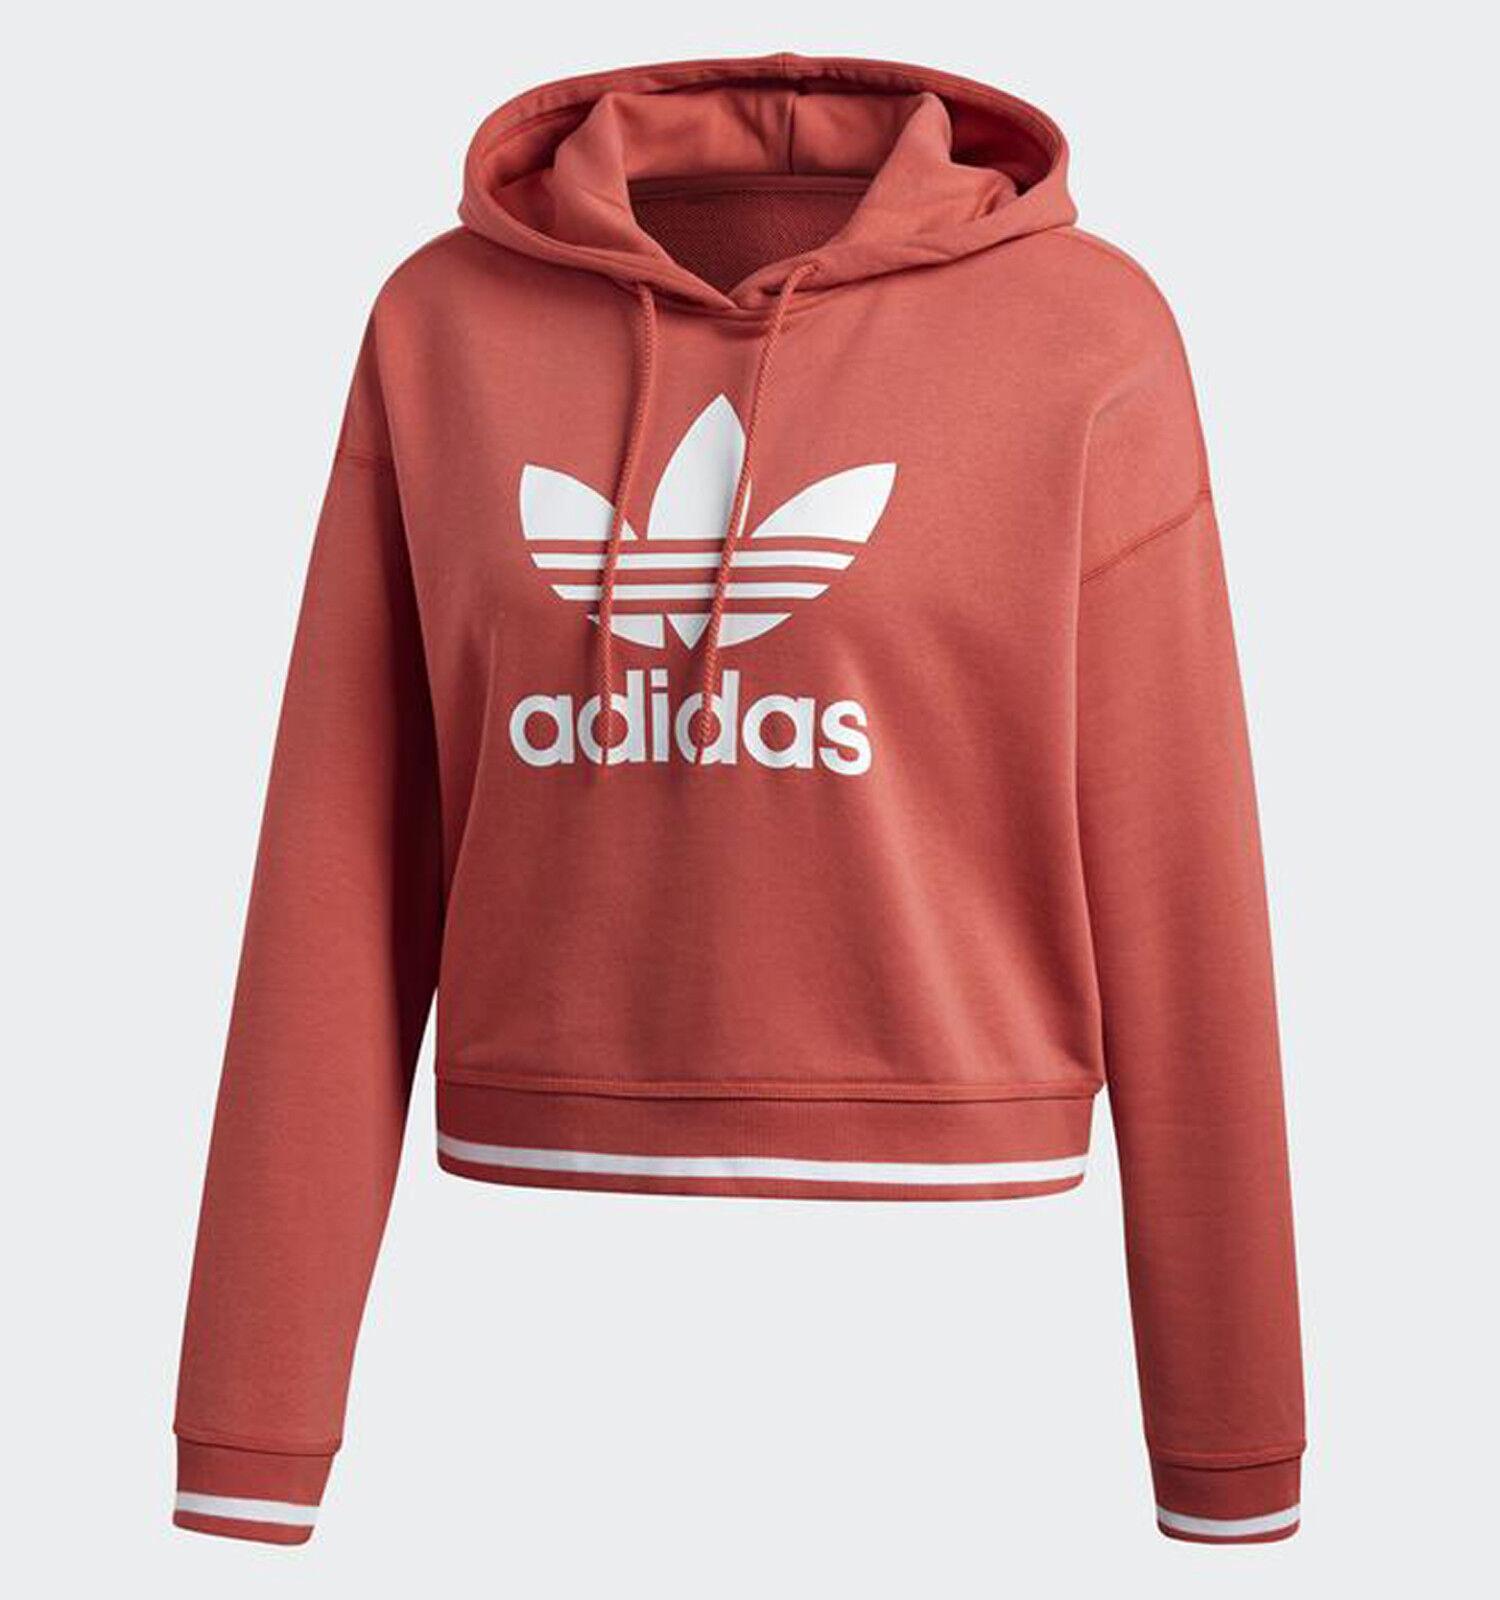 ec51e2056 ACTIVE Women's Originals Adidas ICON White c DH2944 Scarlet Hoodie ...